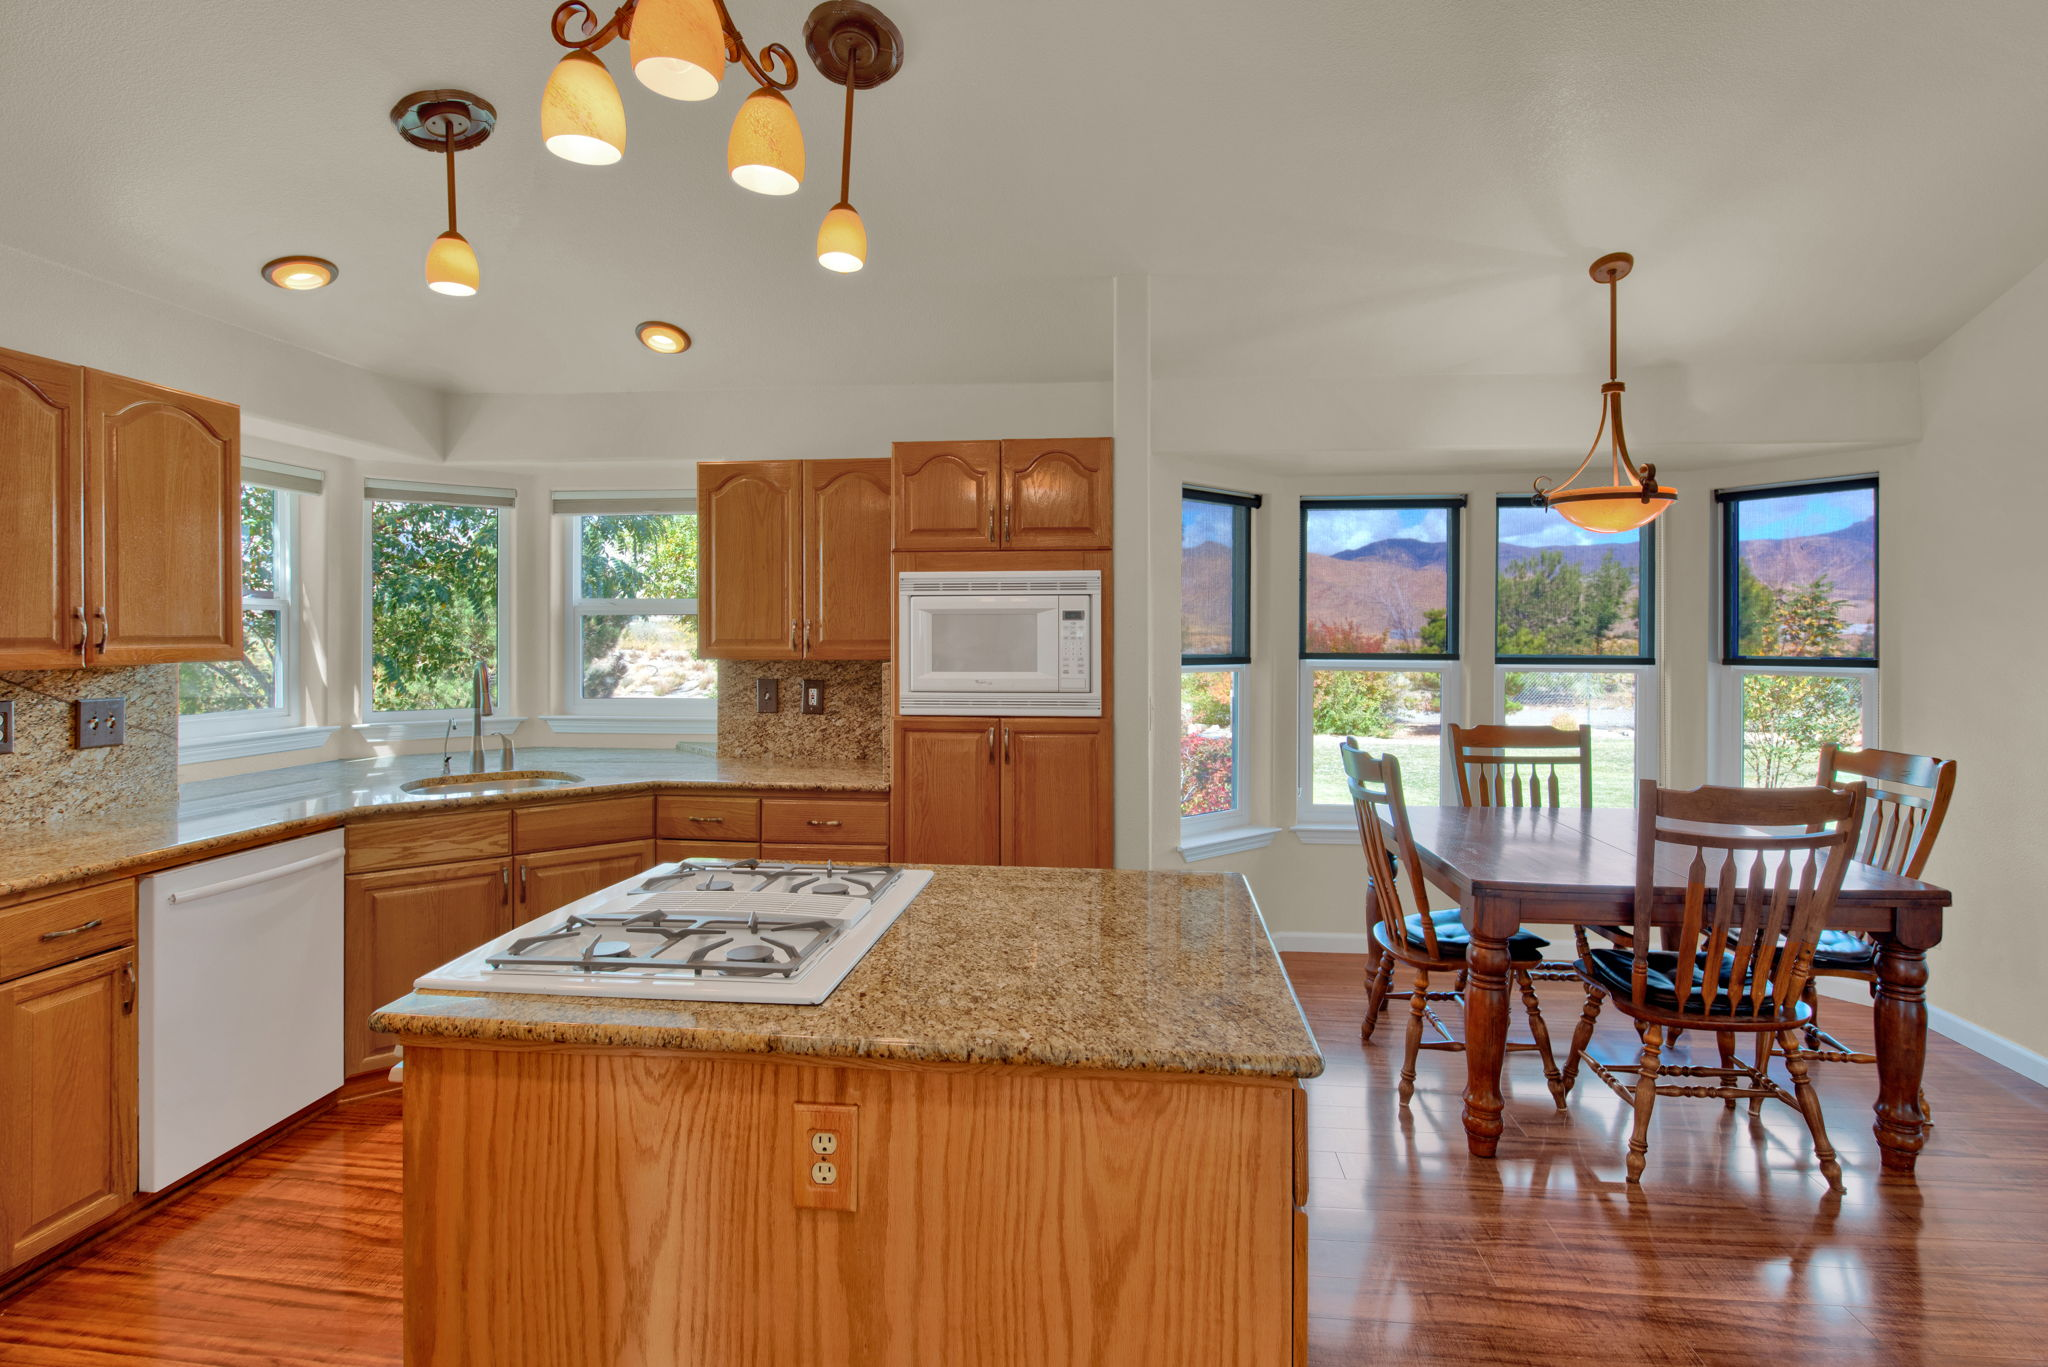 Kitchen view towards backyard